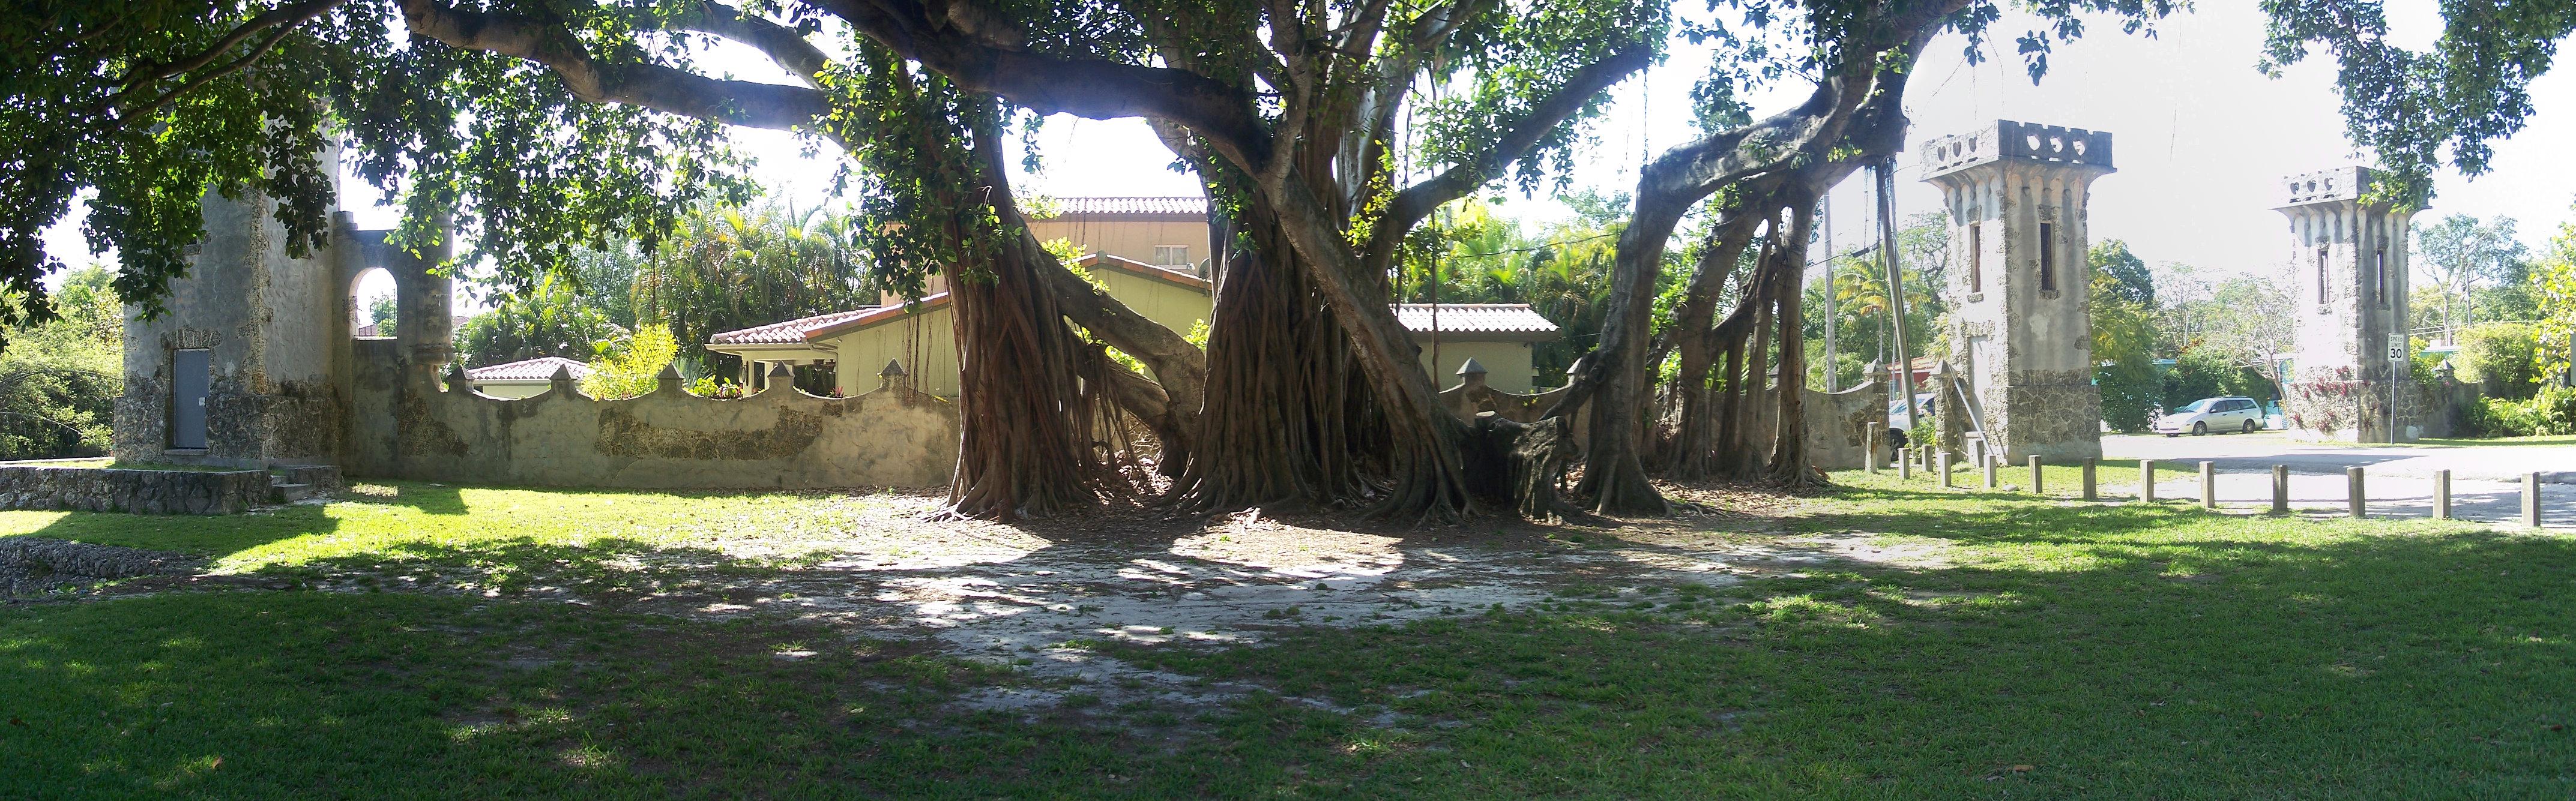 file:coral gables fl entrance to central miami pano01